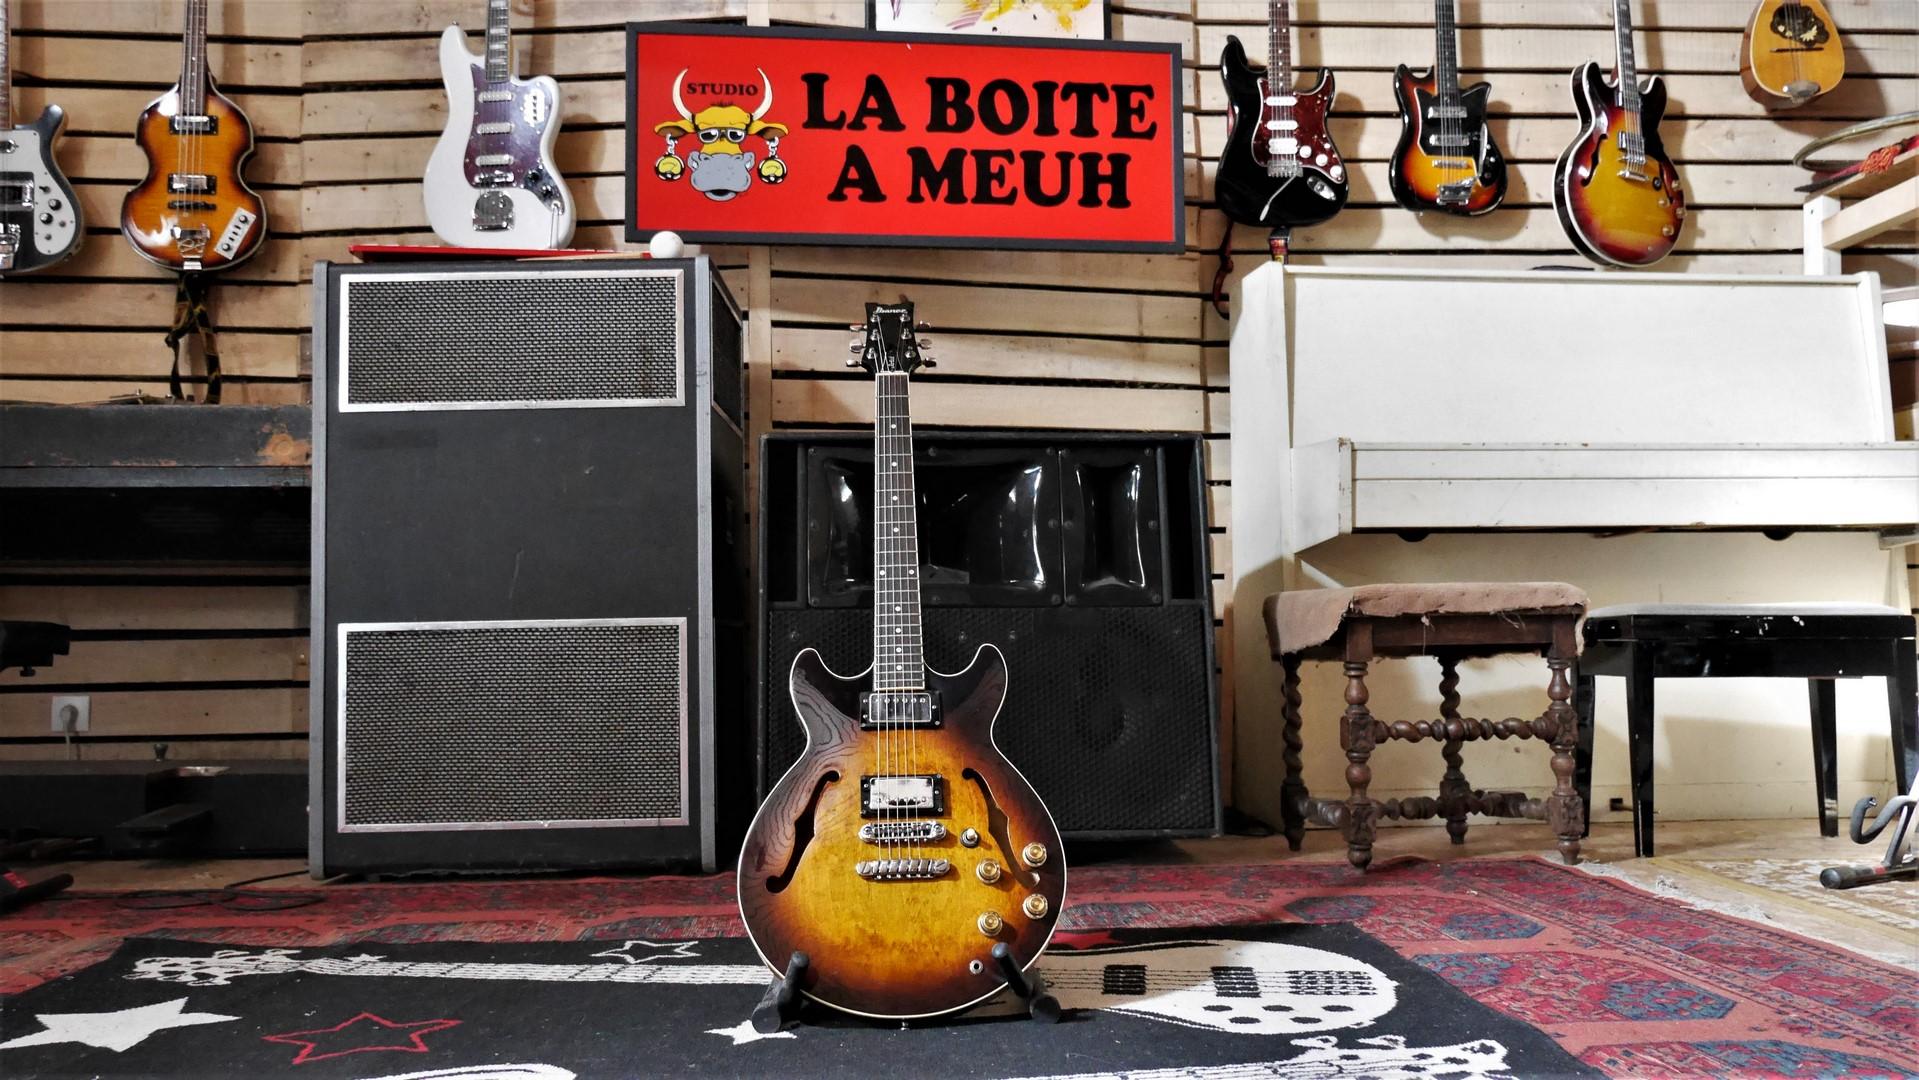 studio-la-boite-a-meuh-ibanez-am50